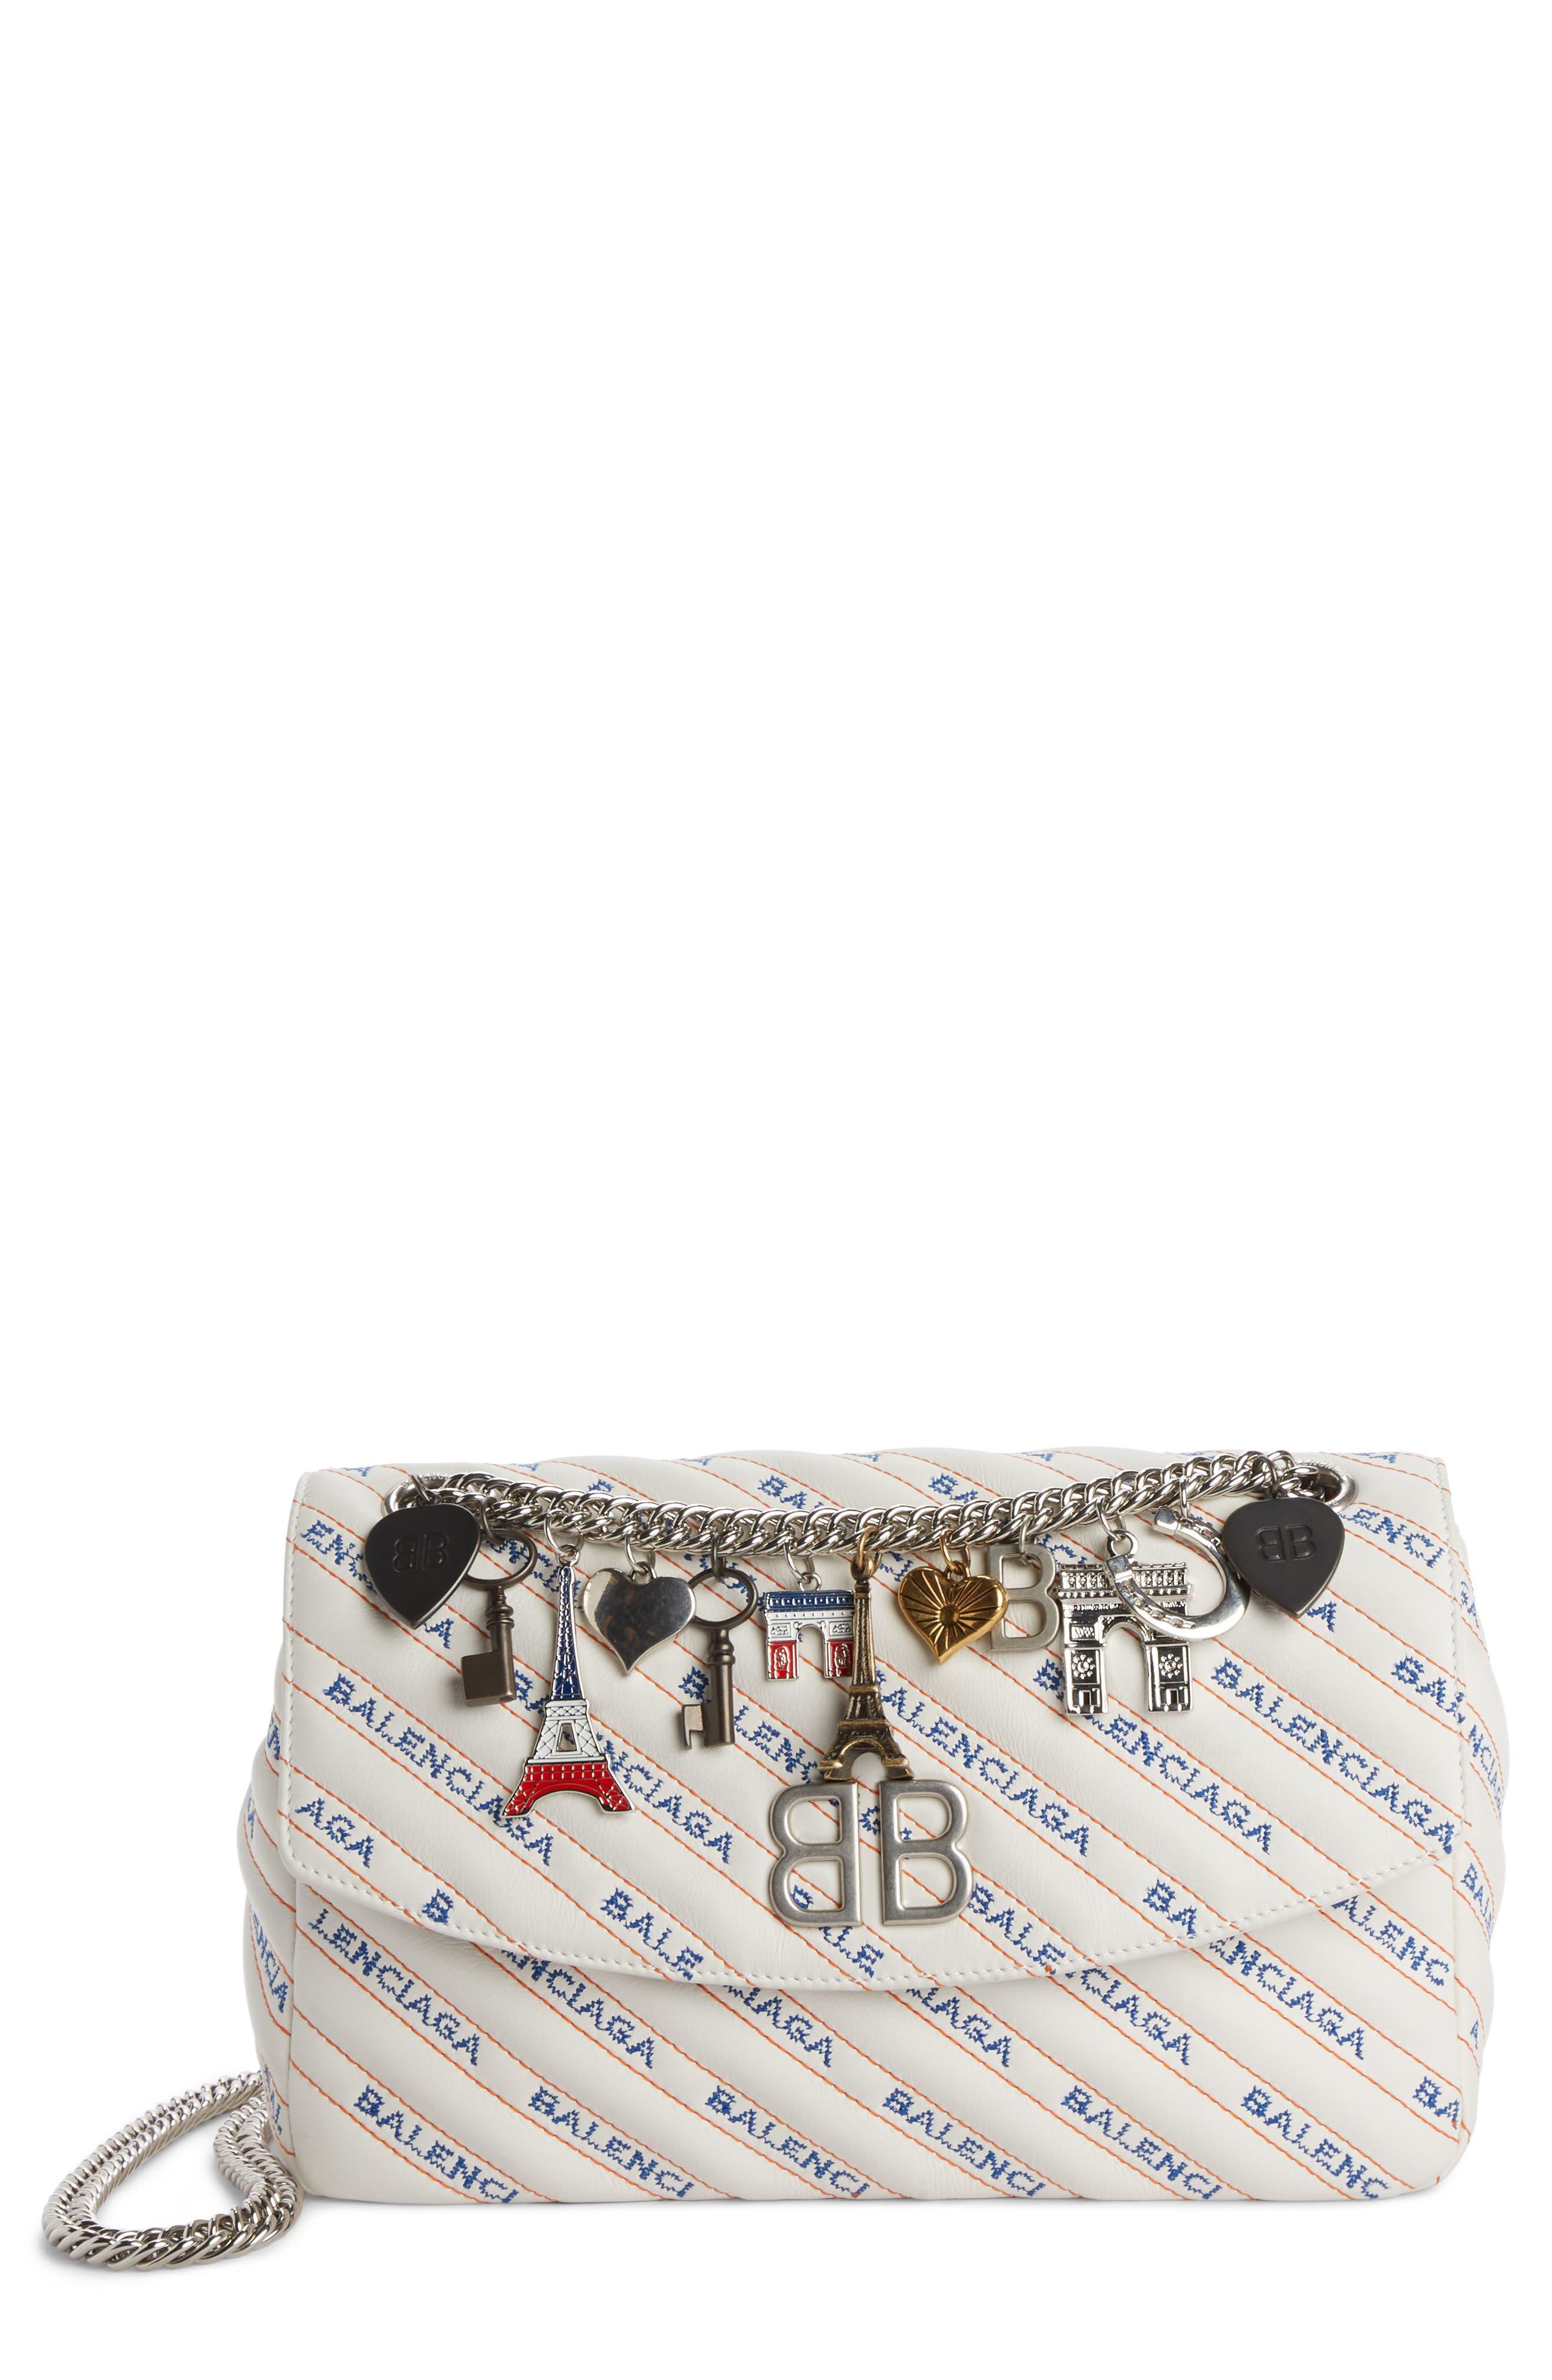 Balenciaga Medium BB Round Logo Charm Crossbody Bag